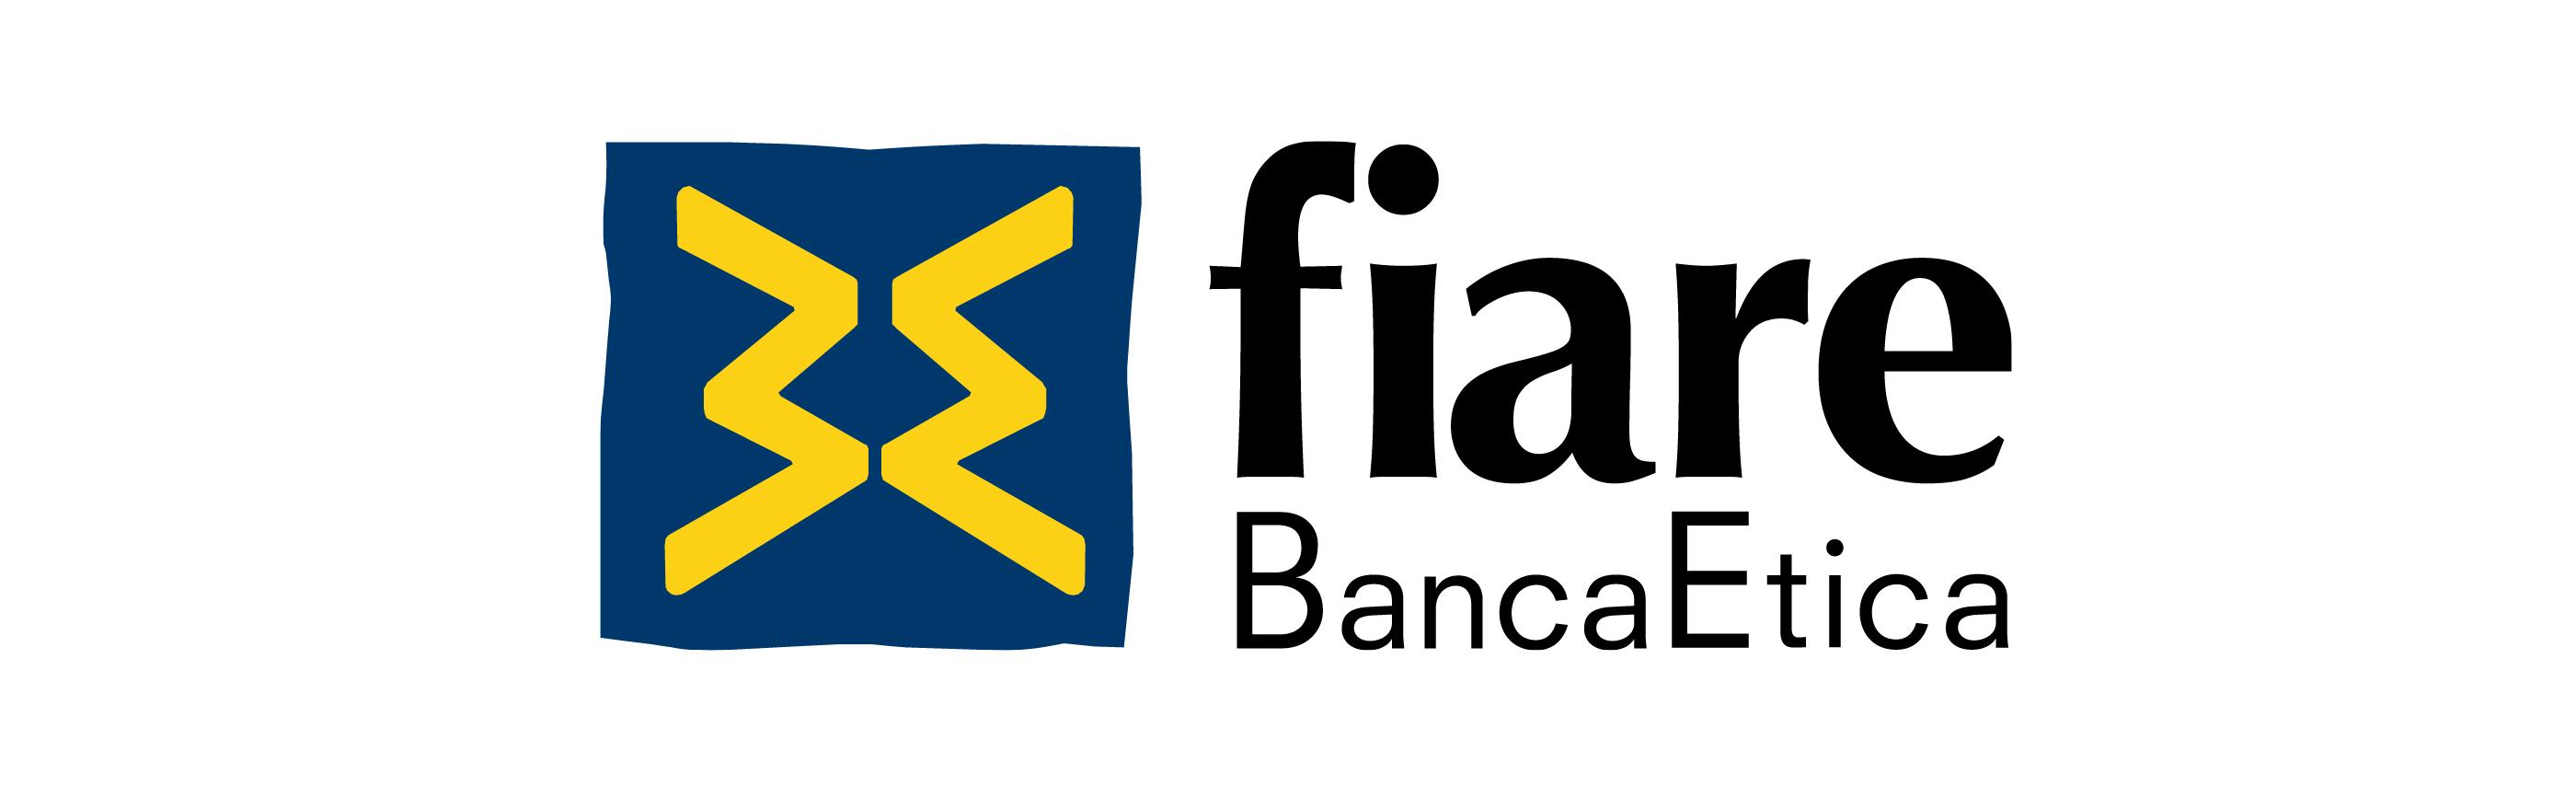 Fiare Banca Ética sigue creciendo en España